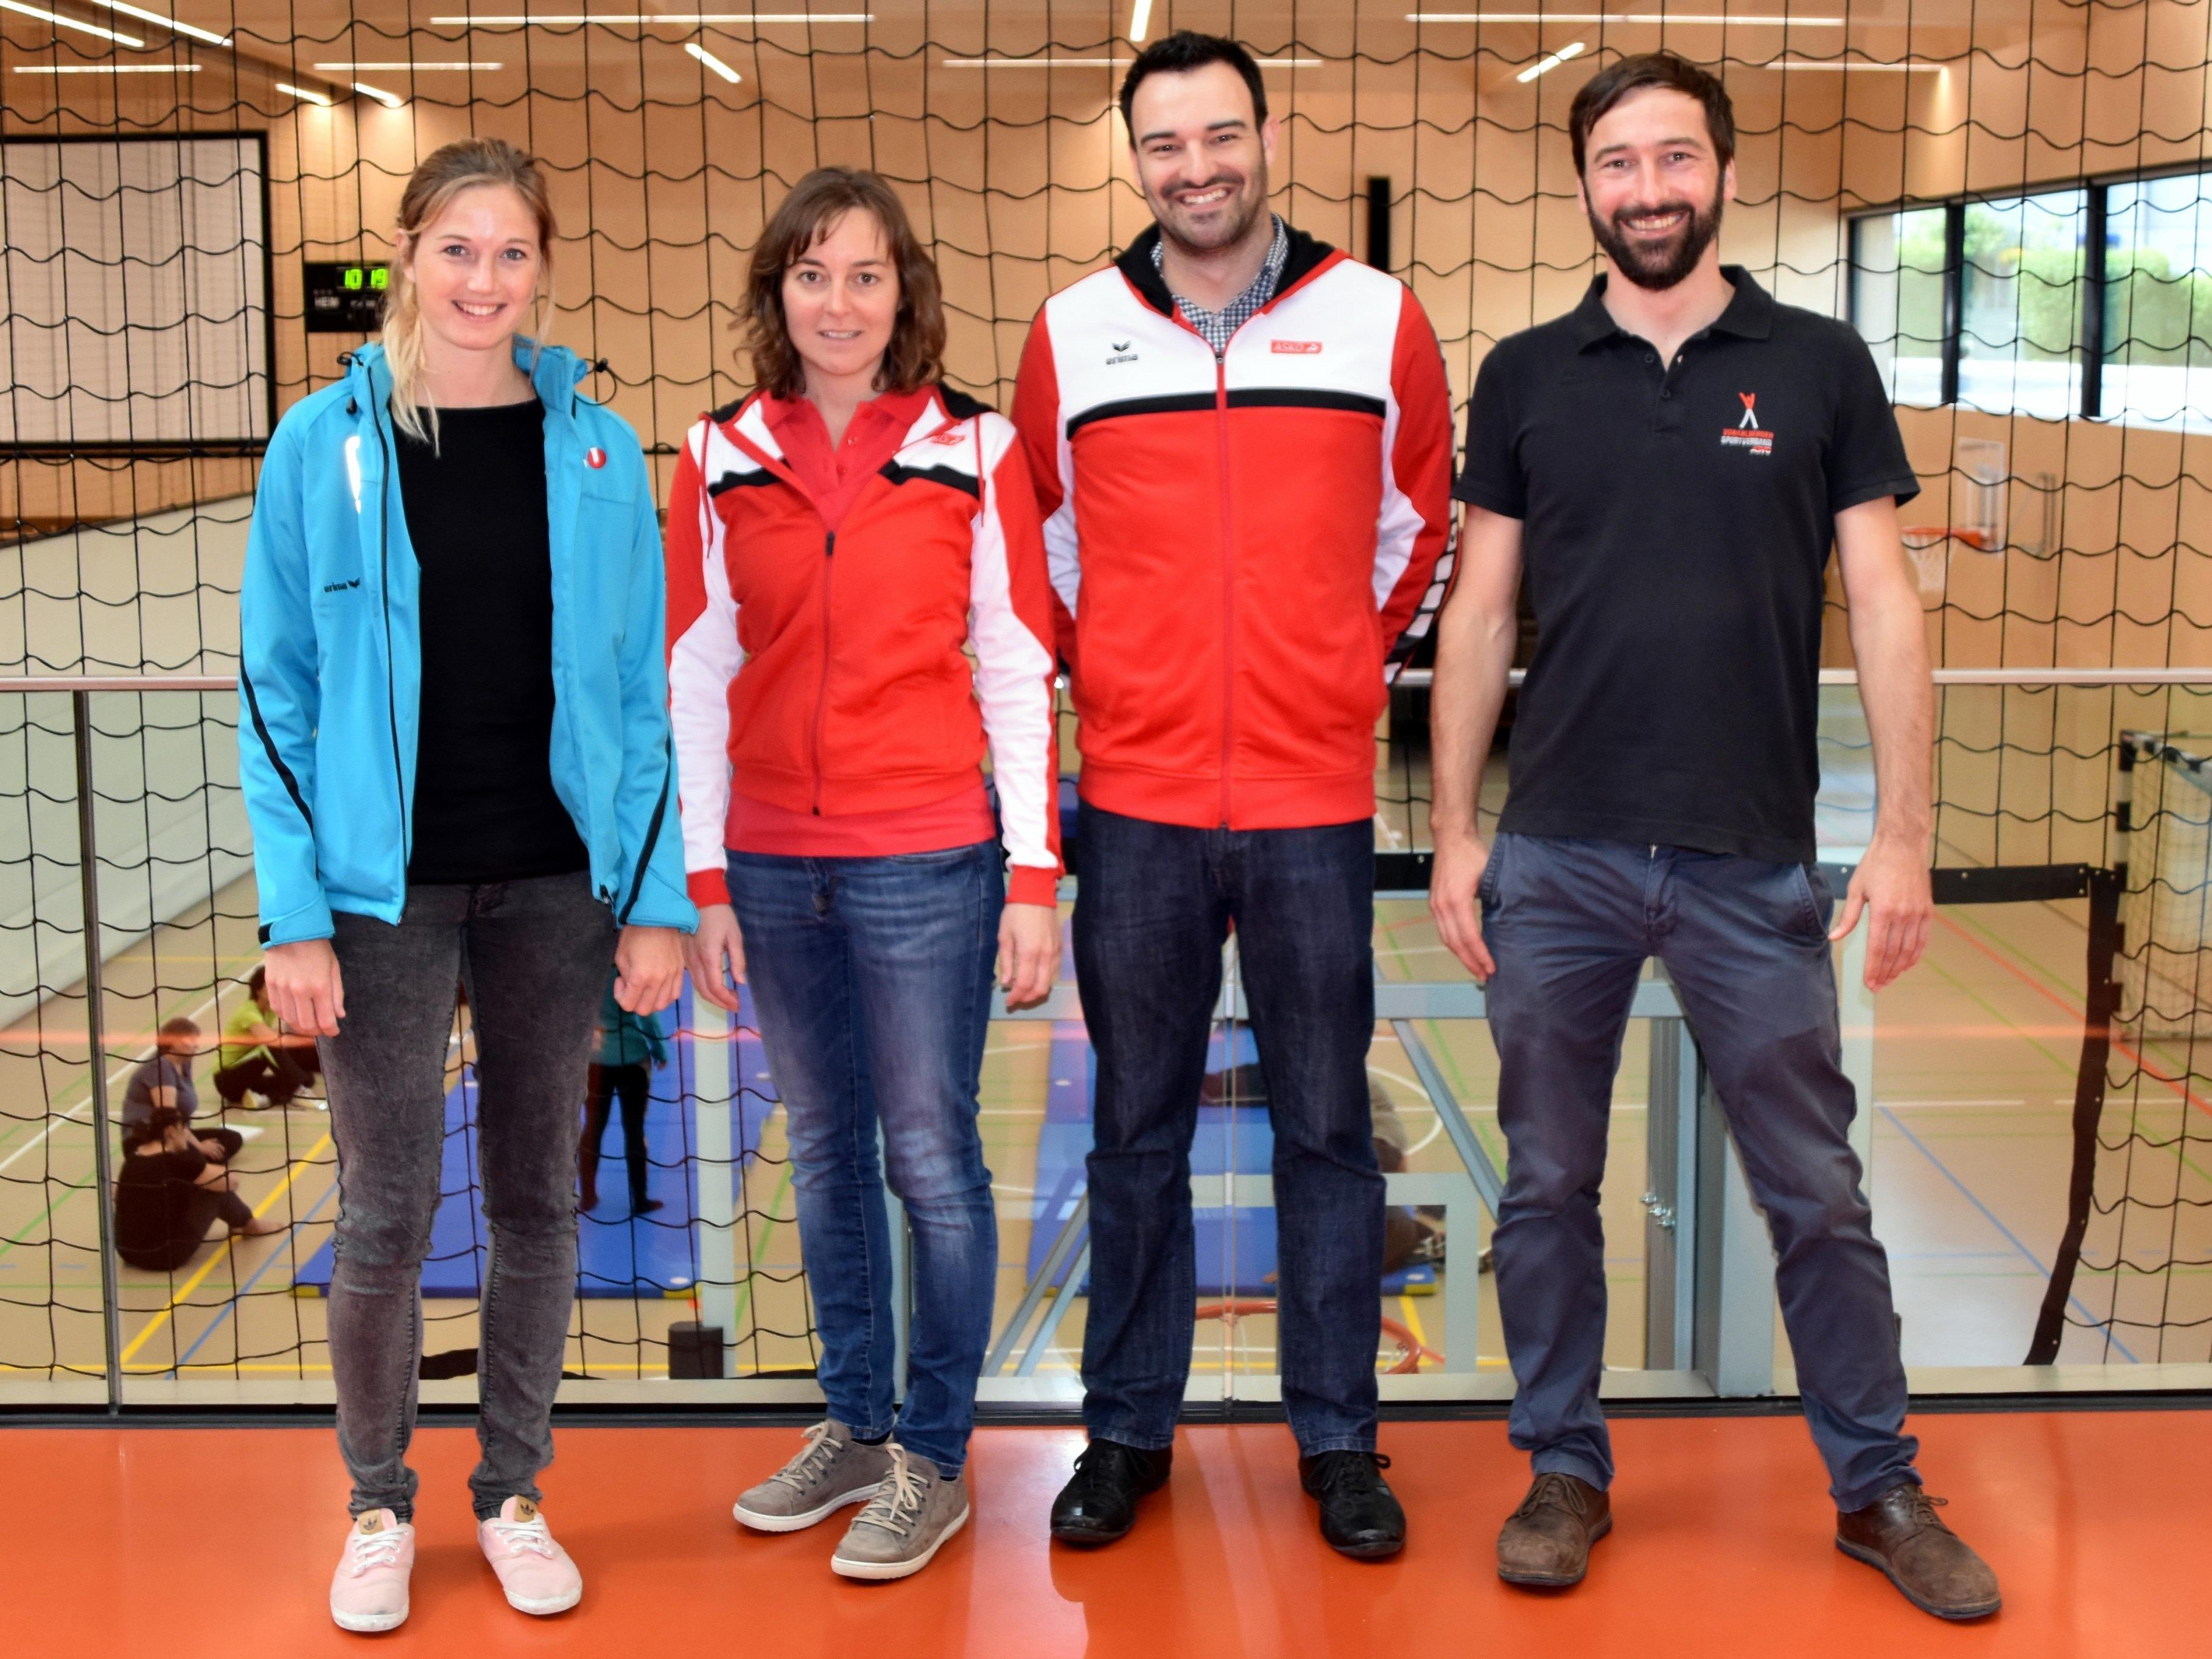 Veranstaltungsteam Lisa Laninschegg (Sportunion), Elisabeth Jetzinger (ASKÖ), Christoph Fröhle (ASKÖ) und Manfred Entner (ASVÖ)